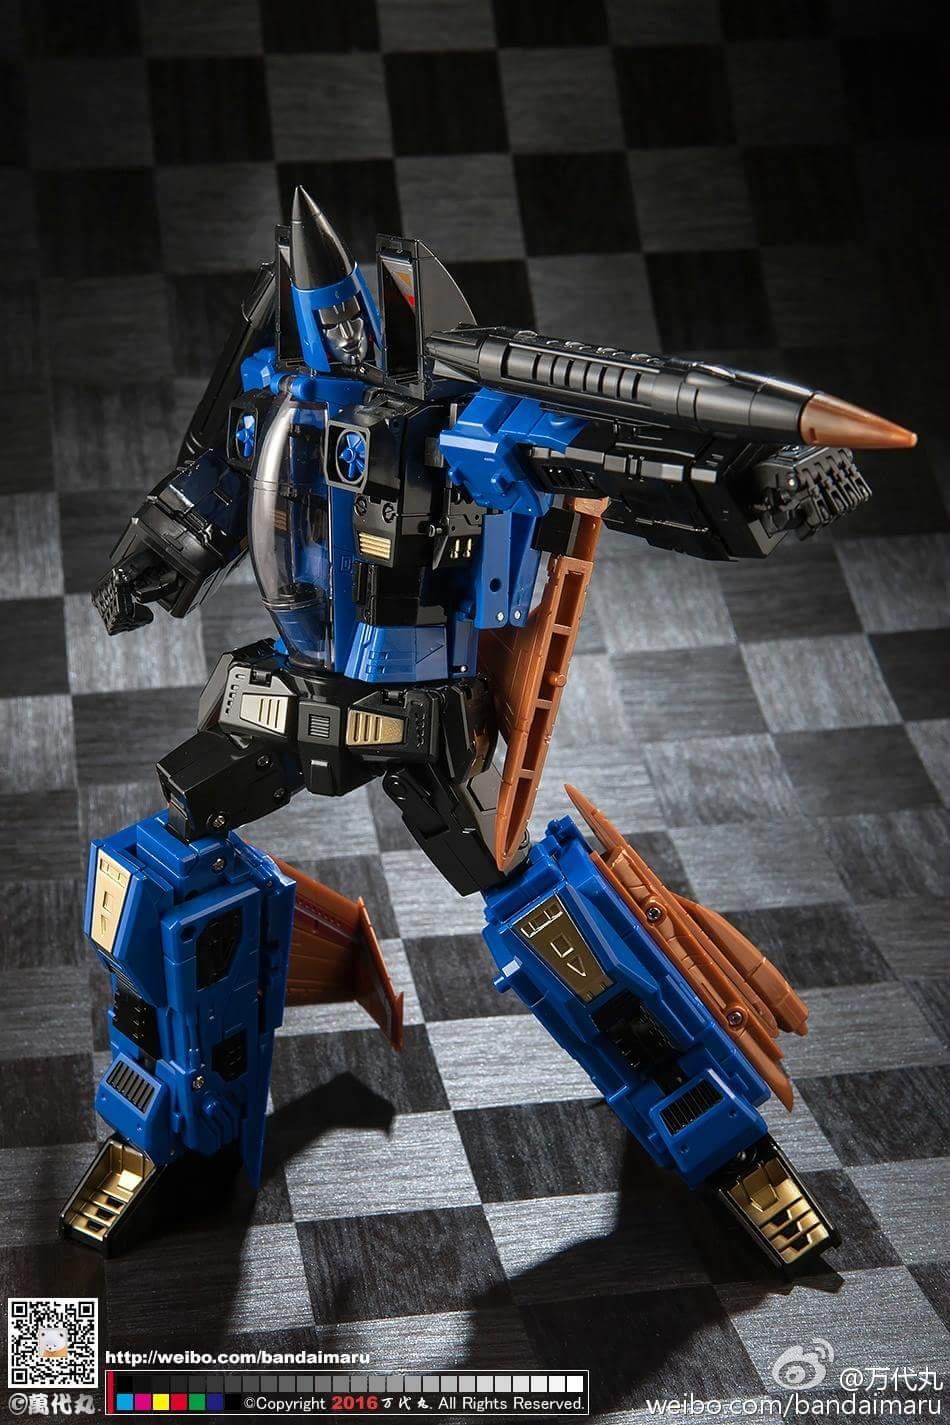 [ToyWorld] Produit Tiers - TW-M02A Combustor (Ramjet/Statoréacto), TW-M02B Assault (Thrust/Fatalo), TW-M02C Requiem (Dirge/Funébro) - Page 3 KN5IYT6a